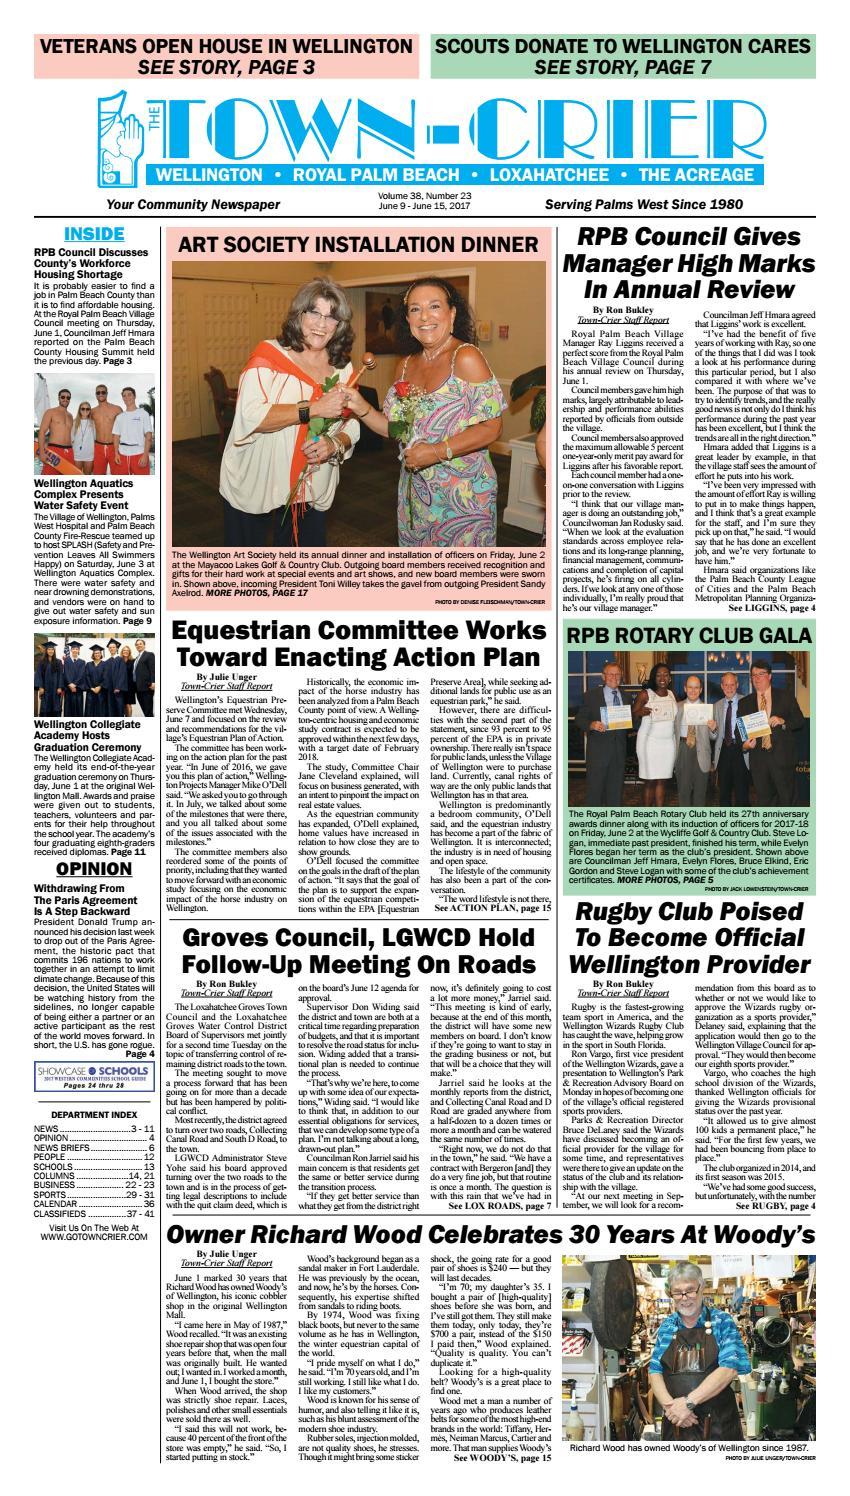 Town Crier Newspaper June 9 2017 By Wellington The Magazine LLC